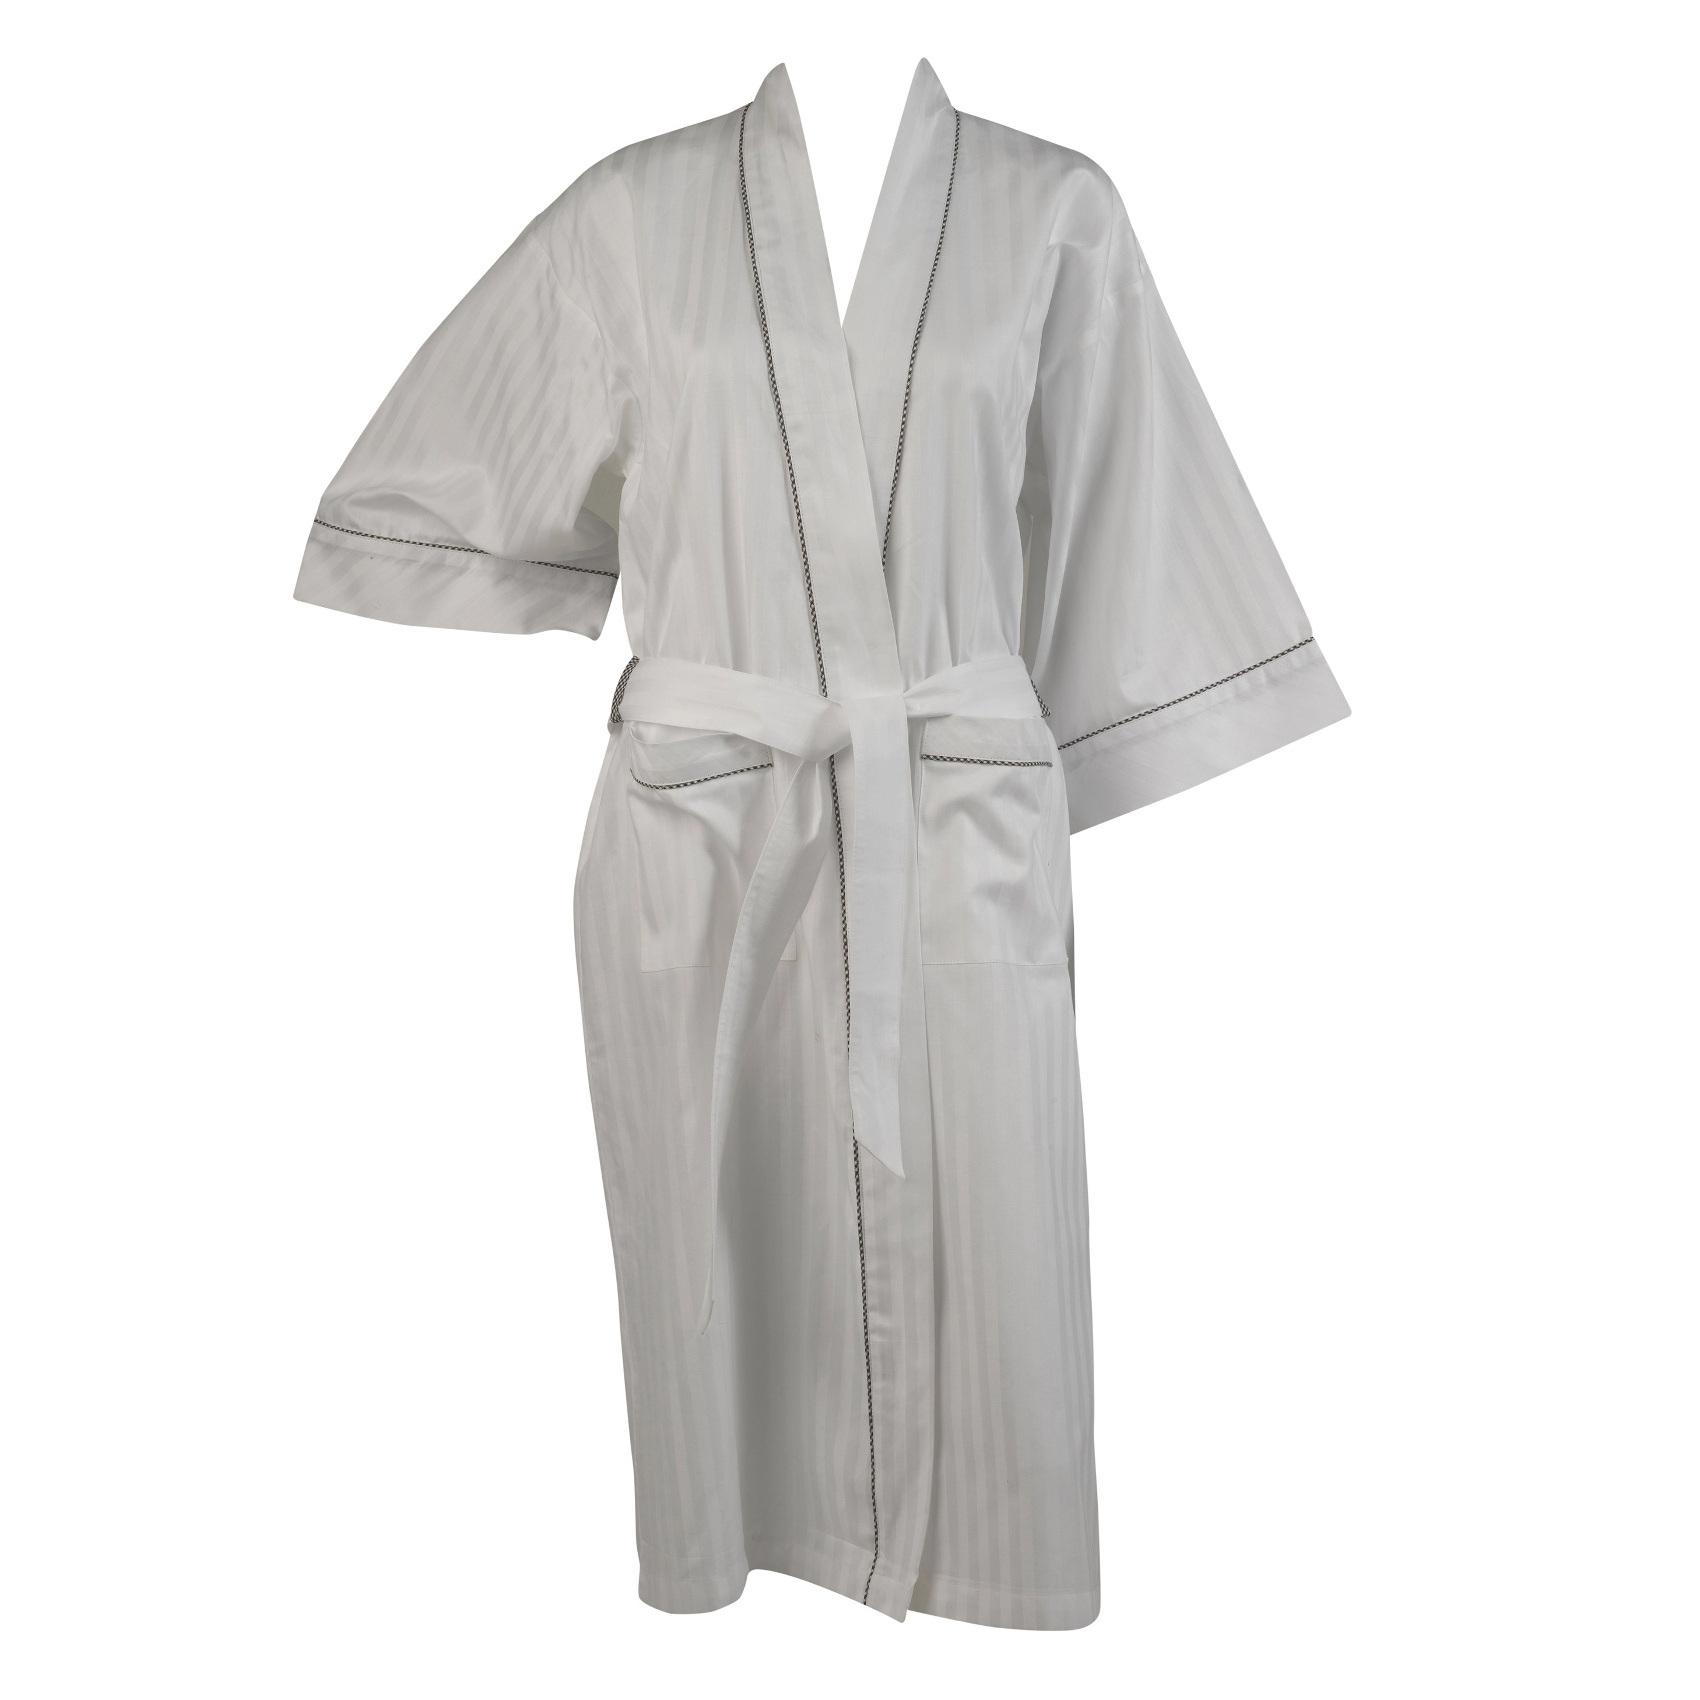 Womens Bath Robe 100% Cotton White Satin Stripe Dressing Gown Wrap ...